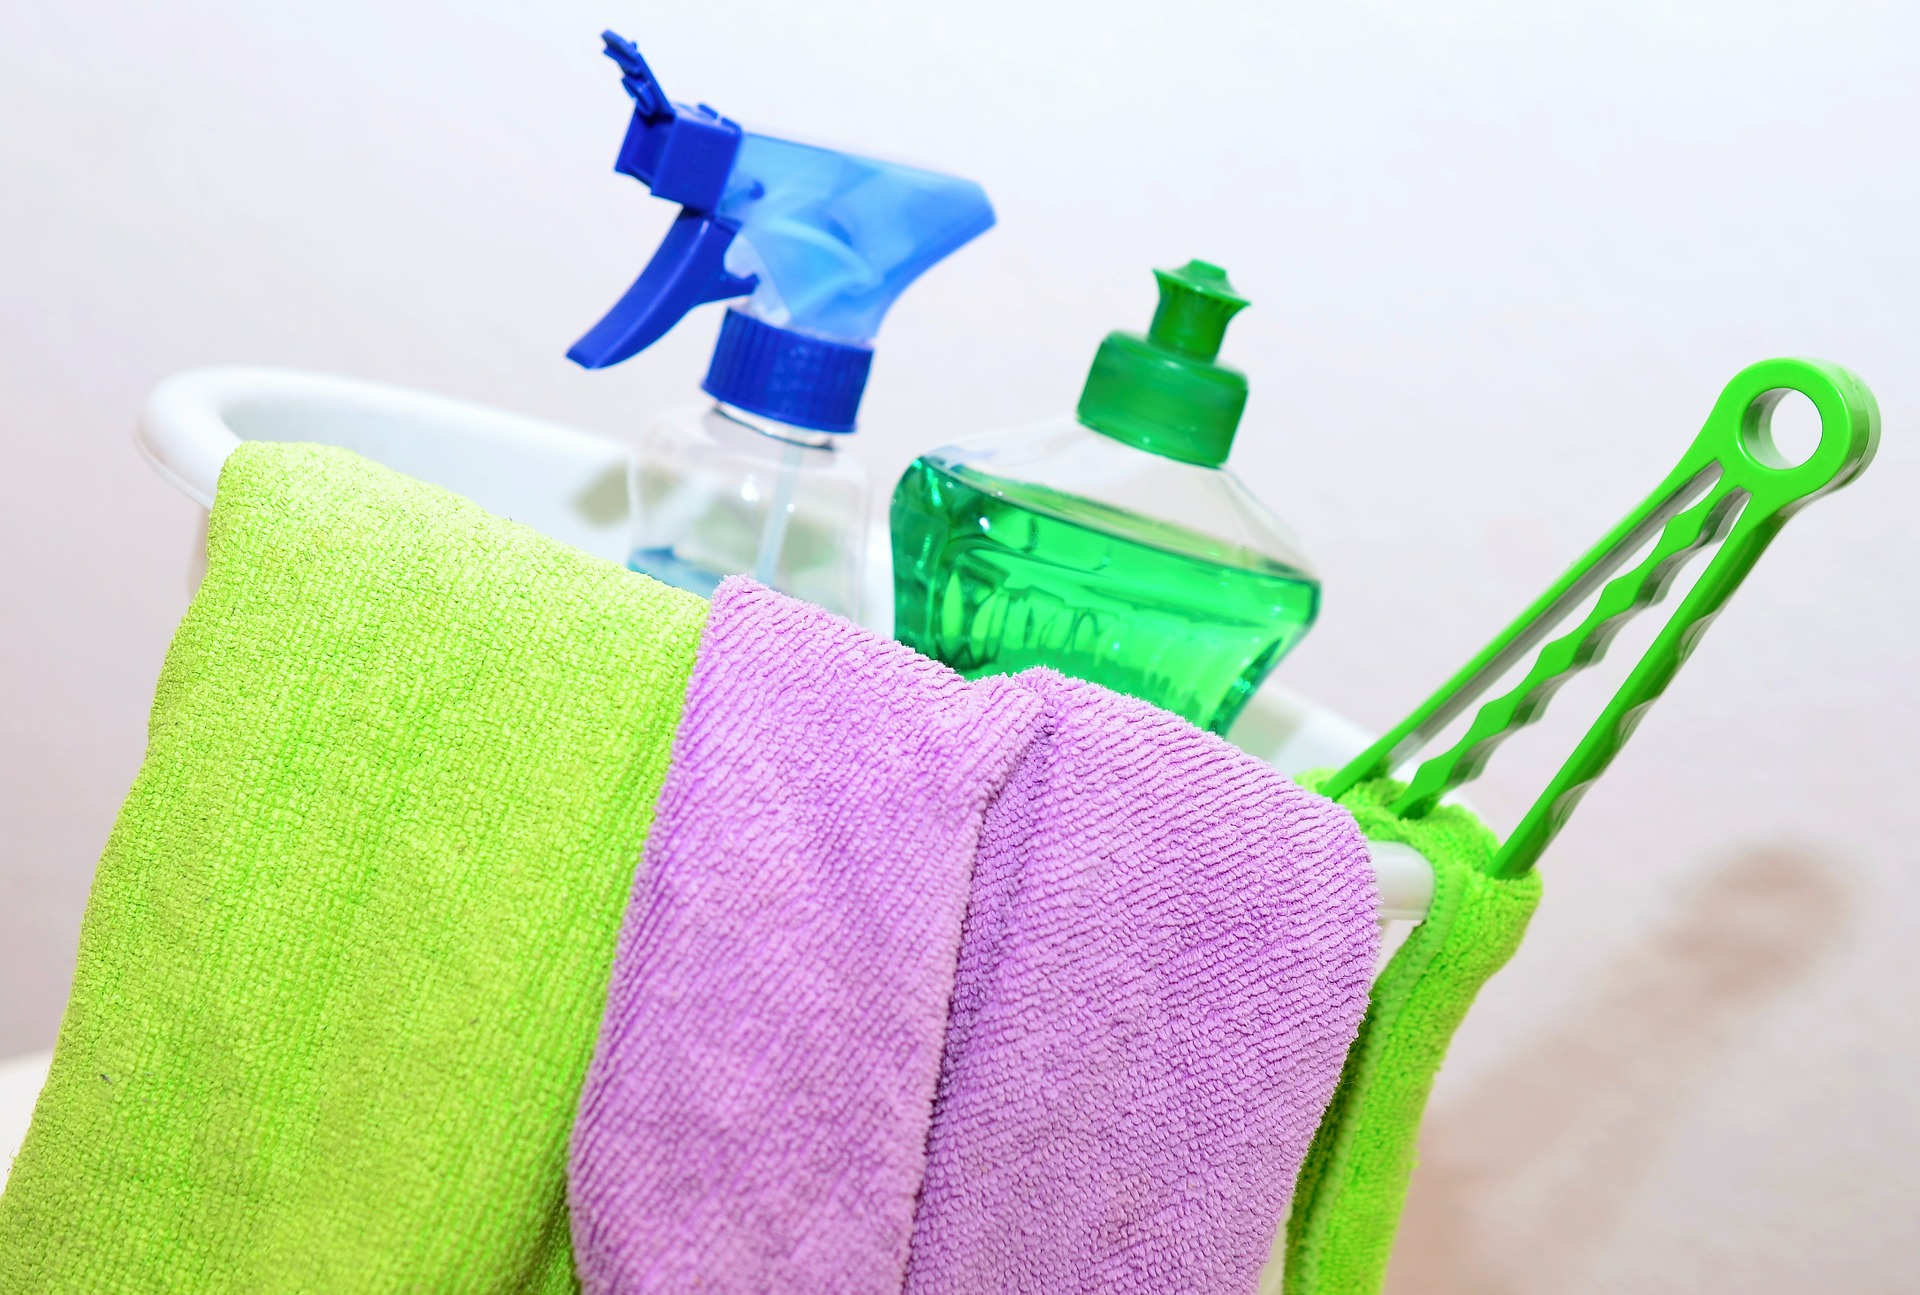 clean-571679_1920.jpg